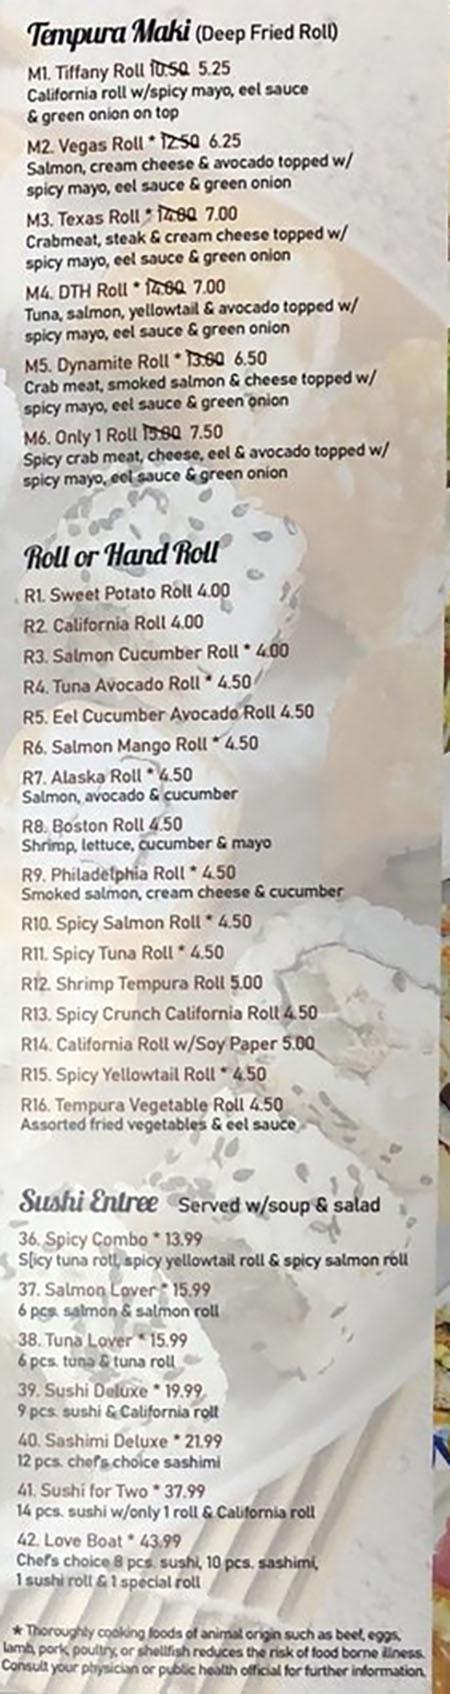 Asian Cuisine & Sushi Bar menu - tempura maki, rolls, hand rolls, sushi entree